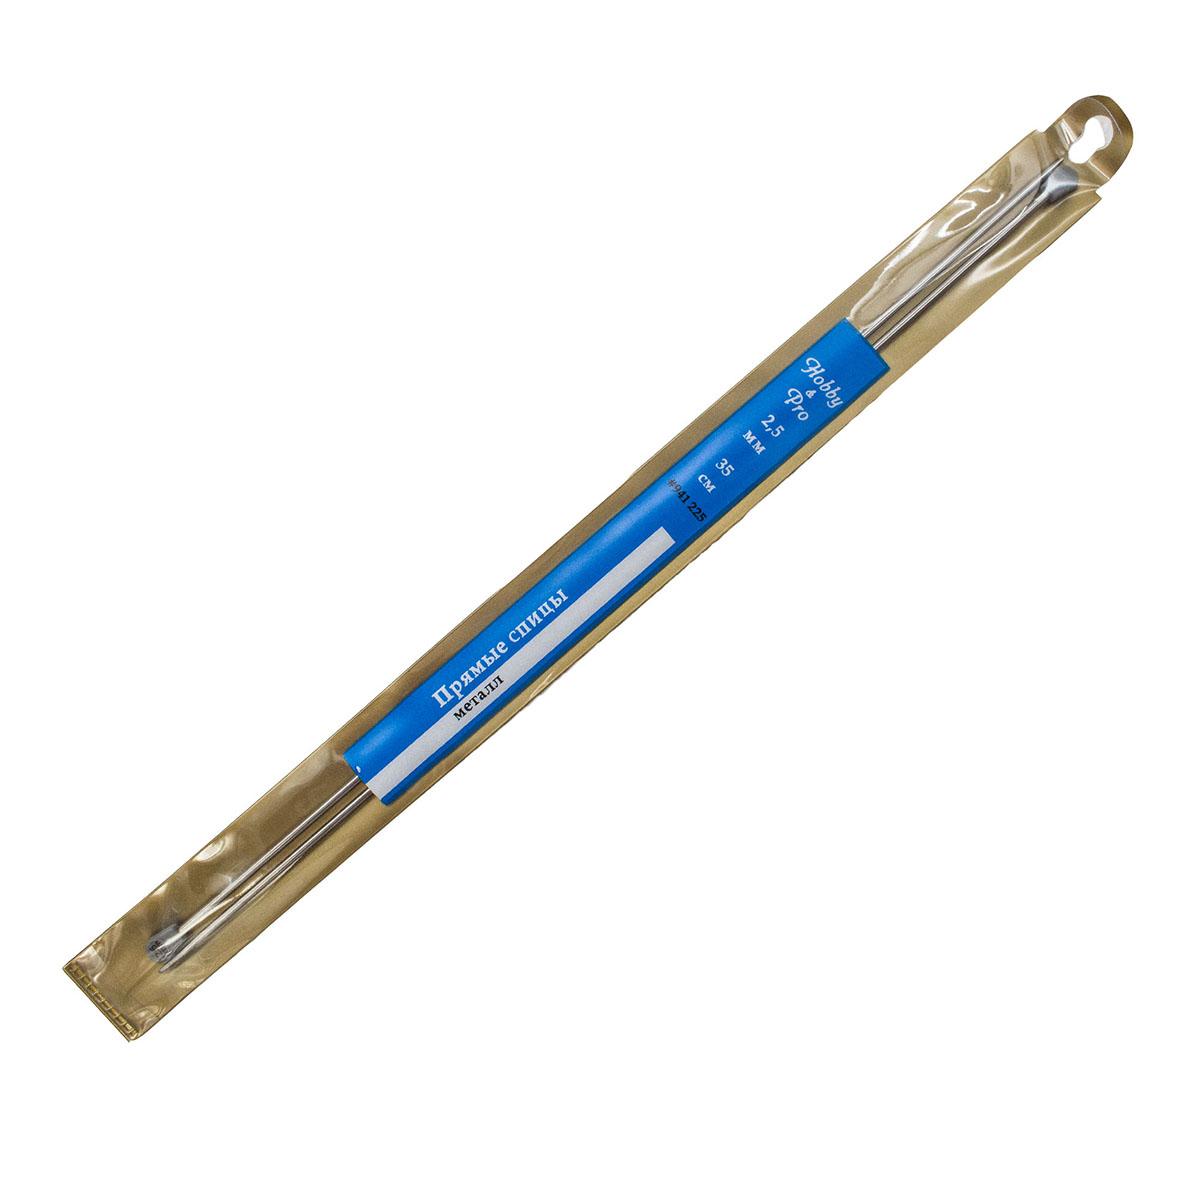 941225 Спицы прямые металл 35см, 2,5мм Hobby&Pro